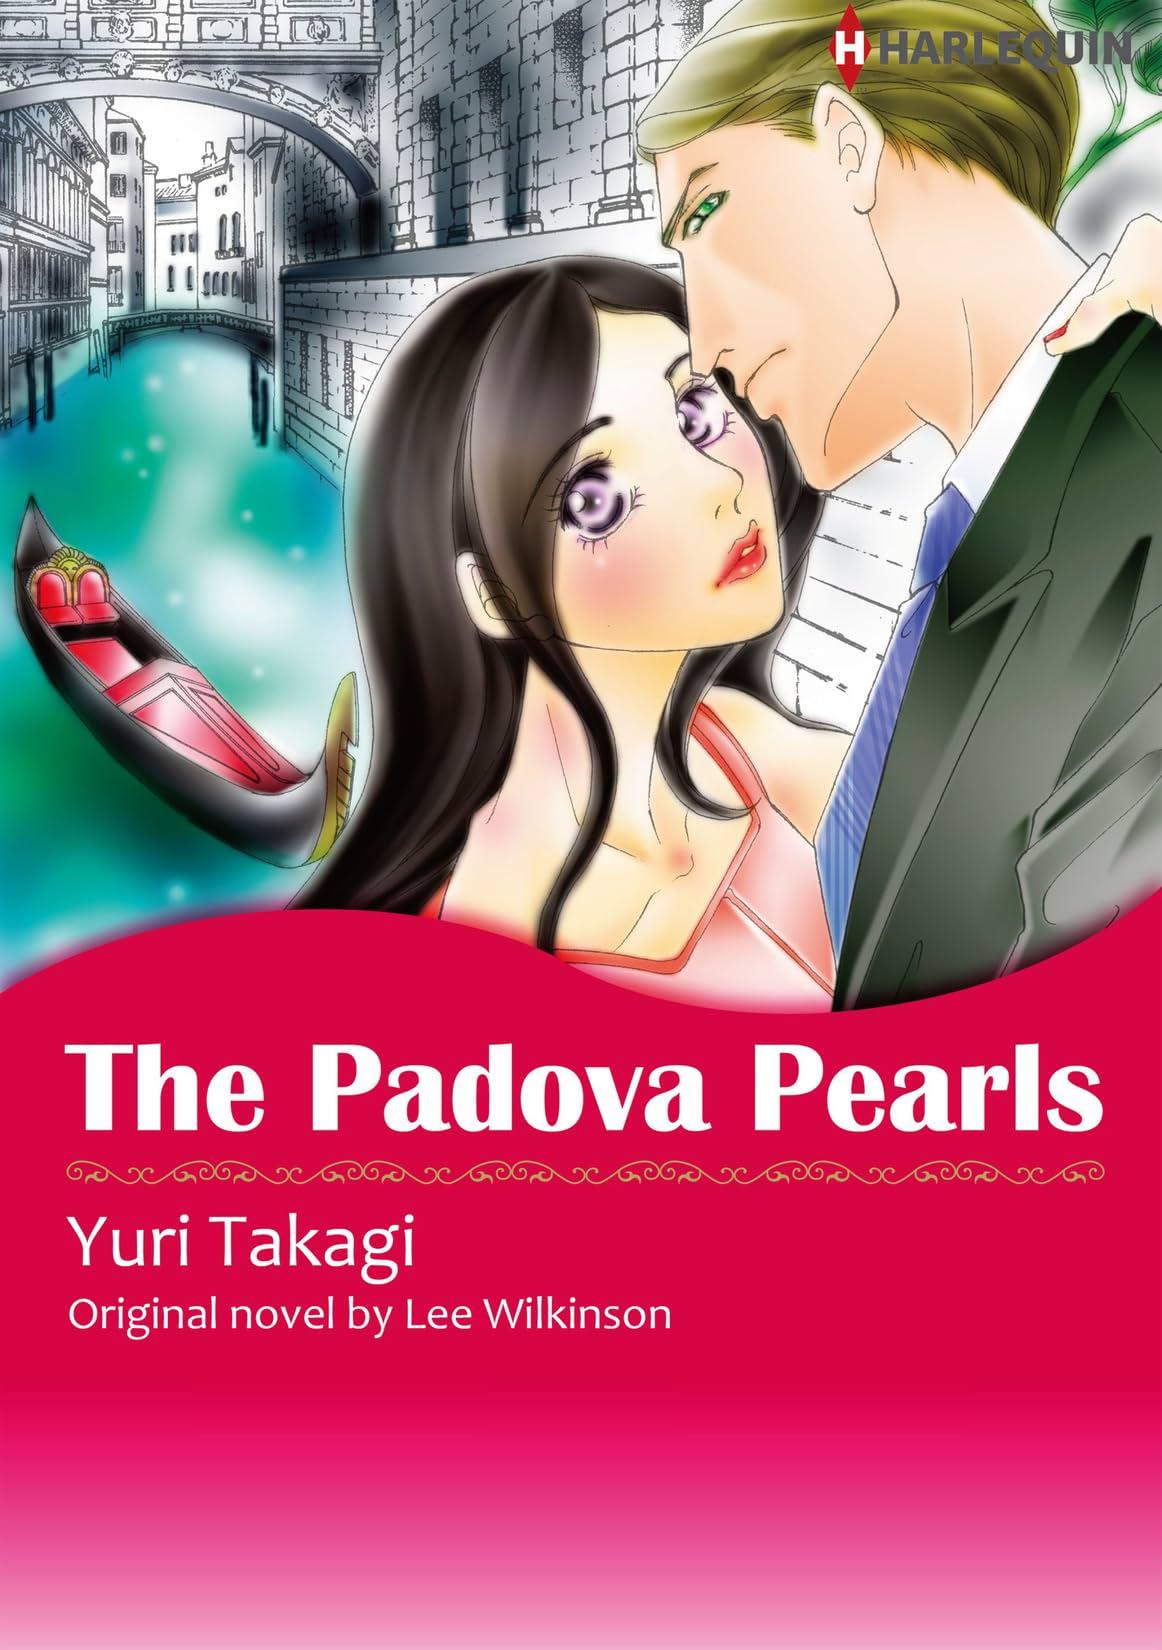 The Padova Pearls